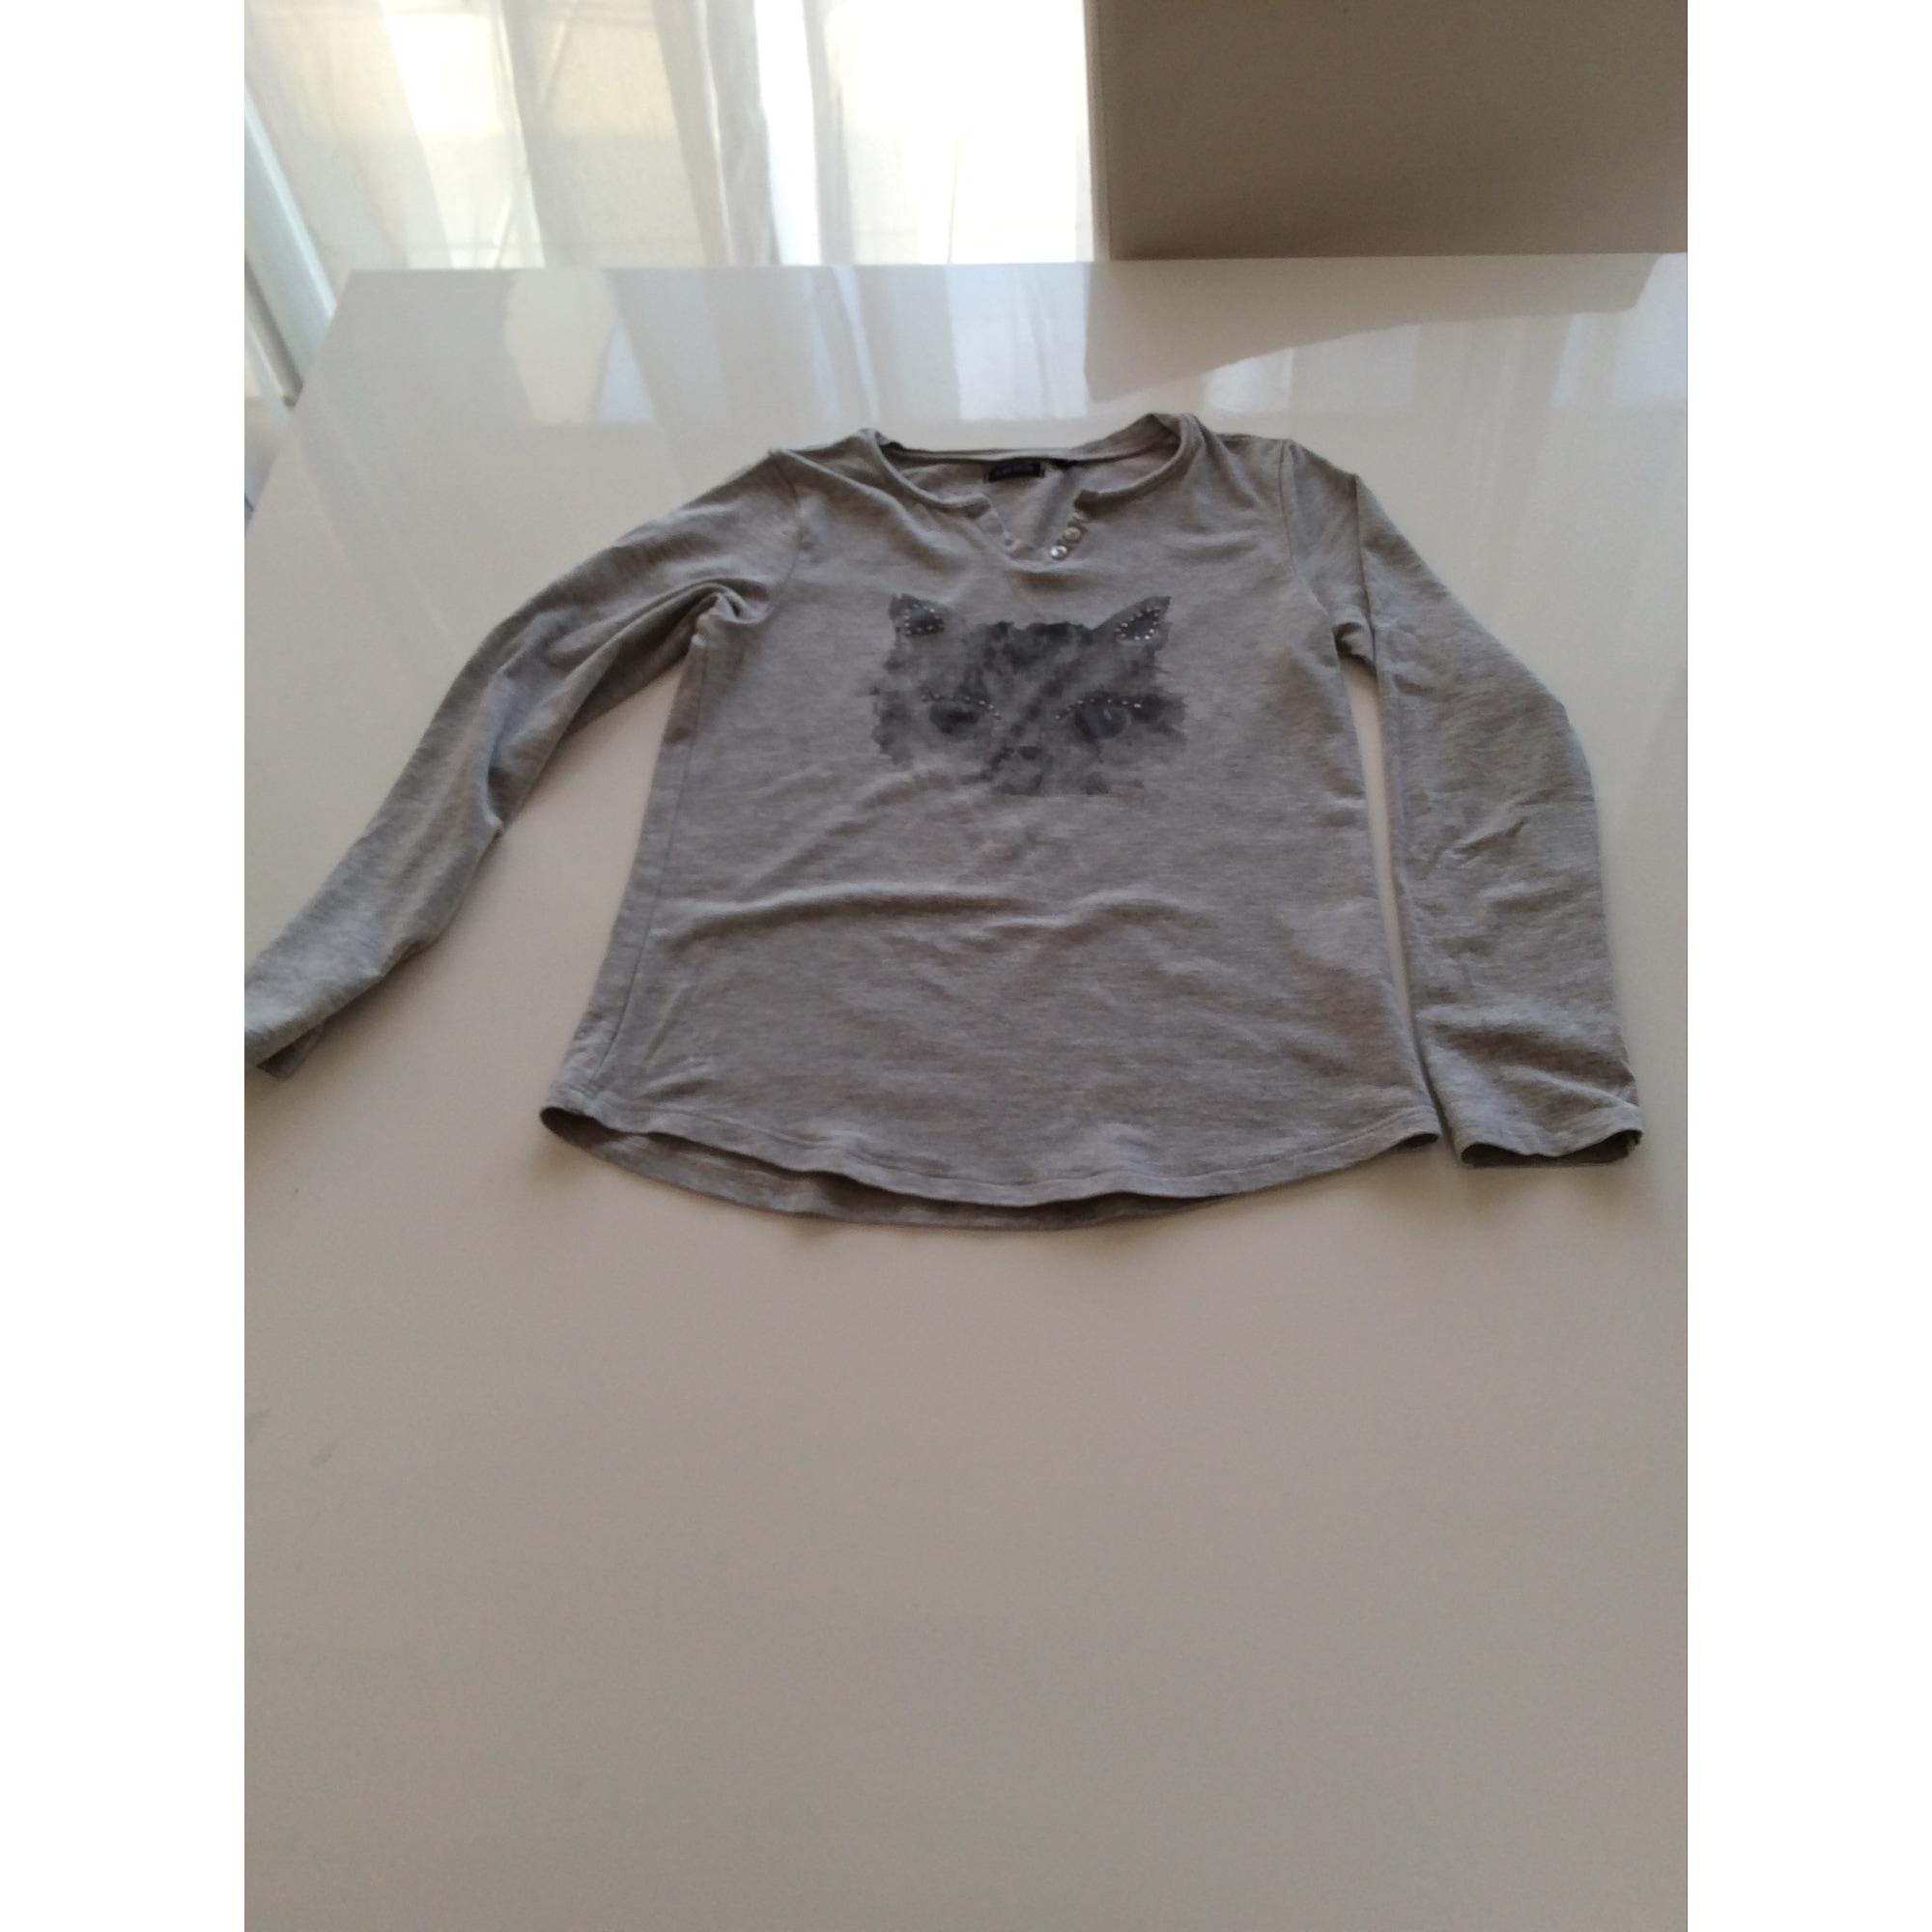 Top, Tee-shirt IKKS Argenté, acier